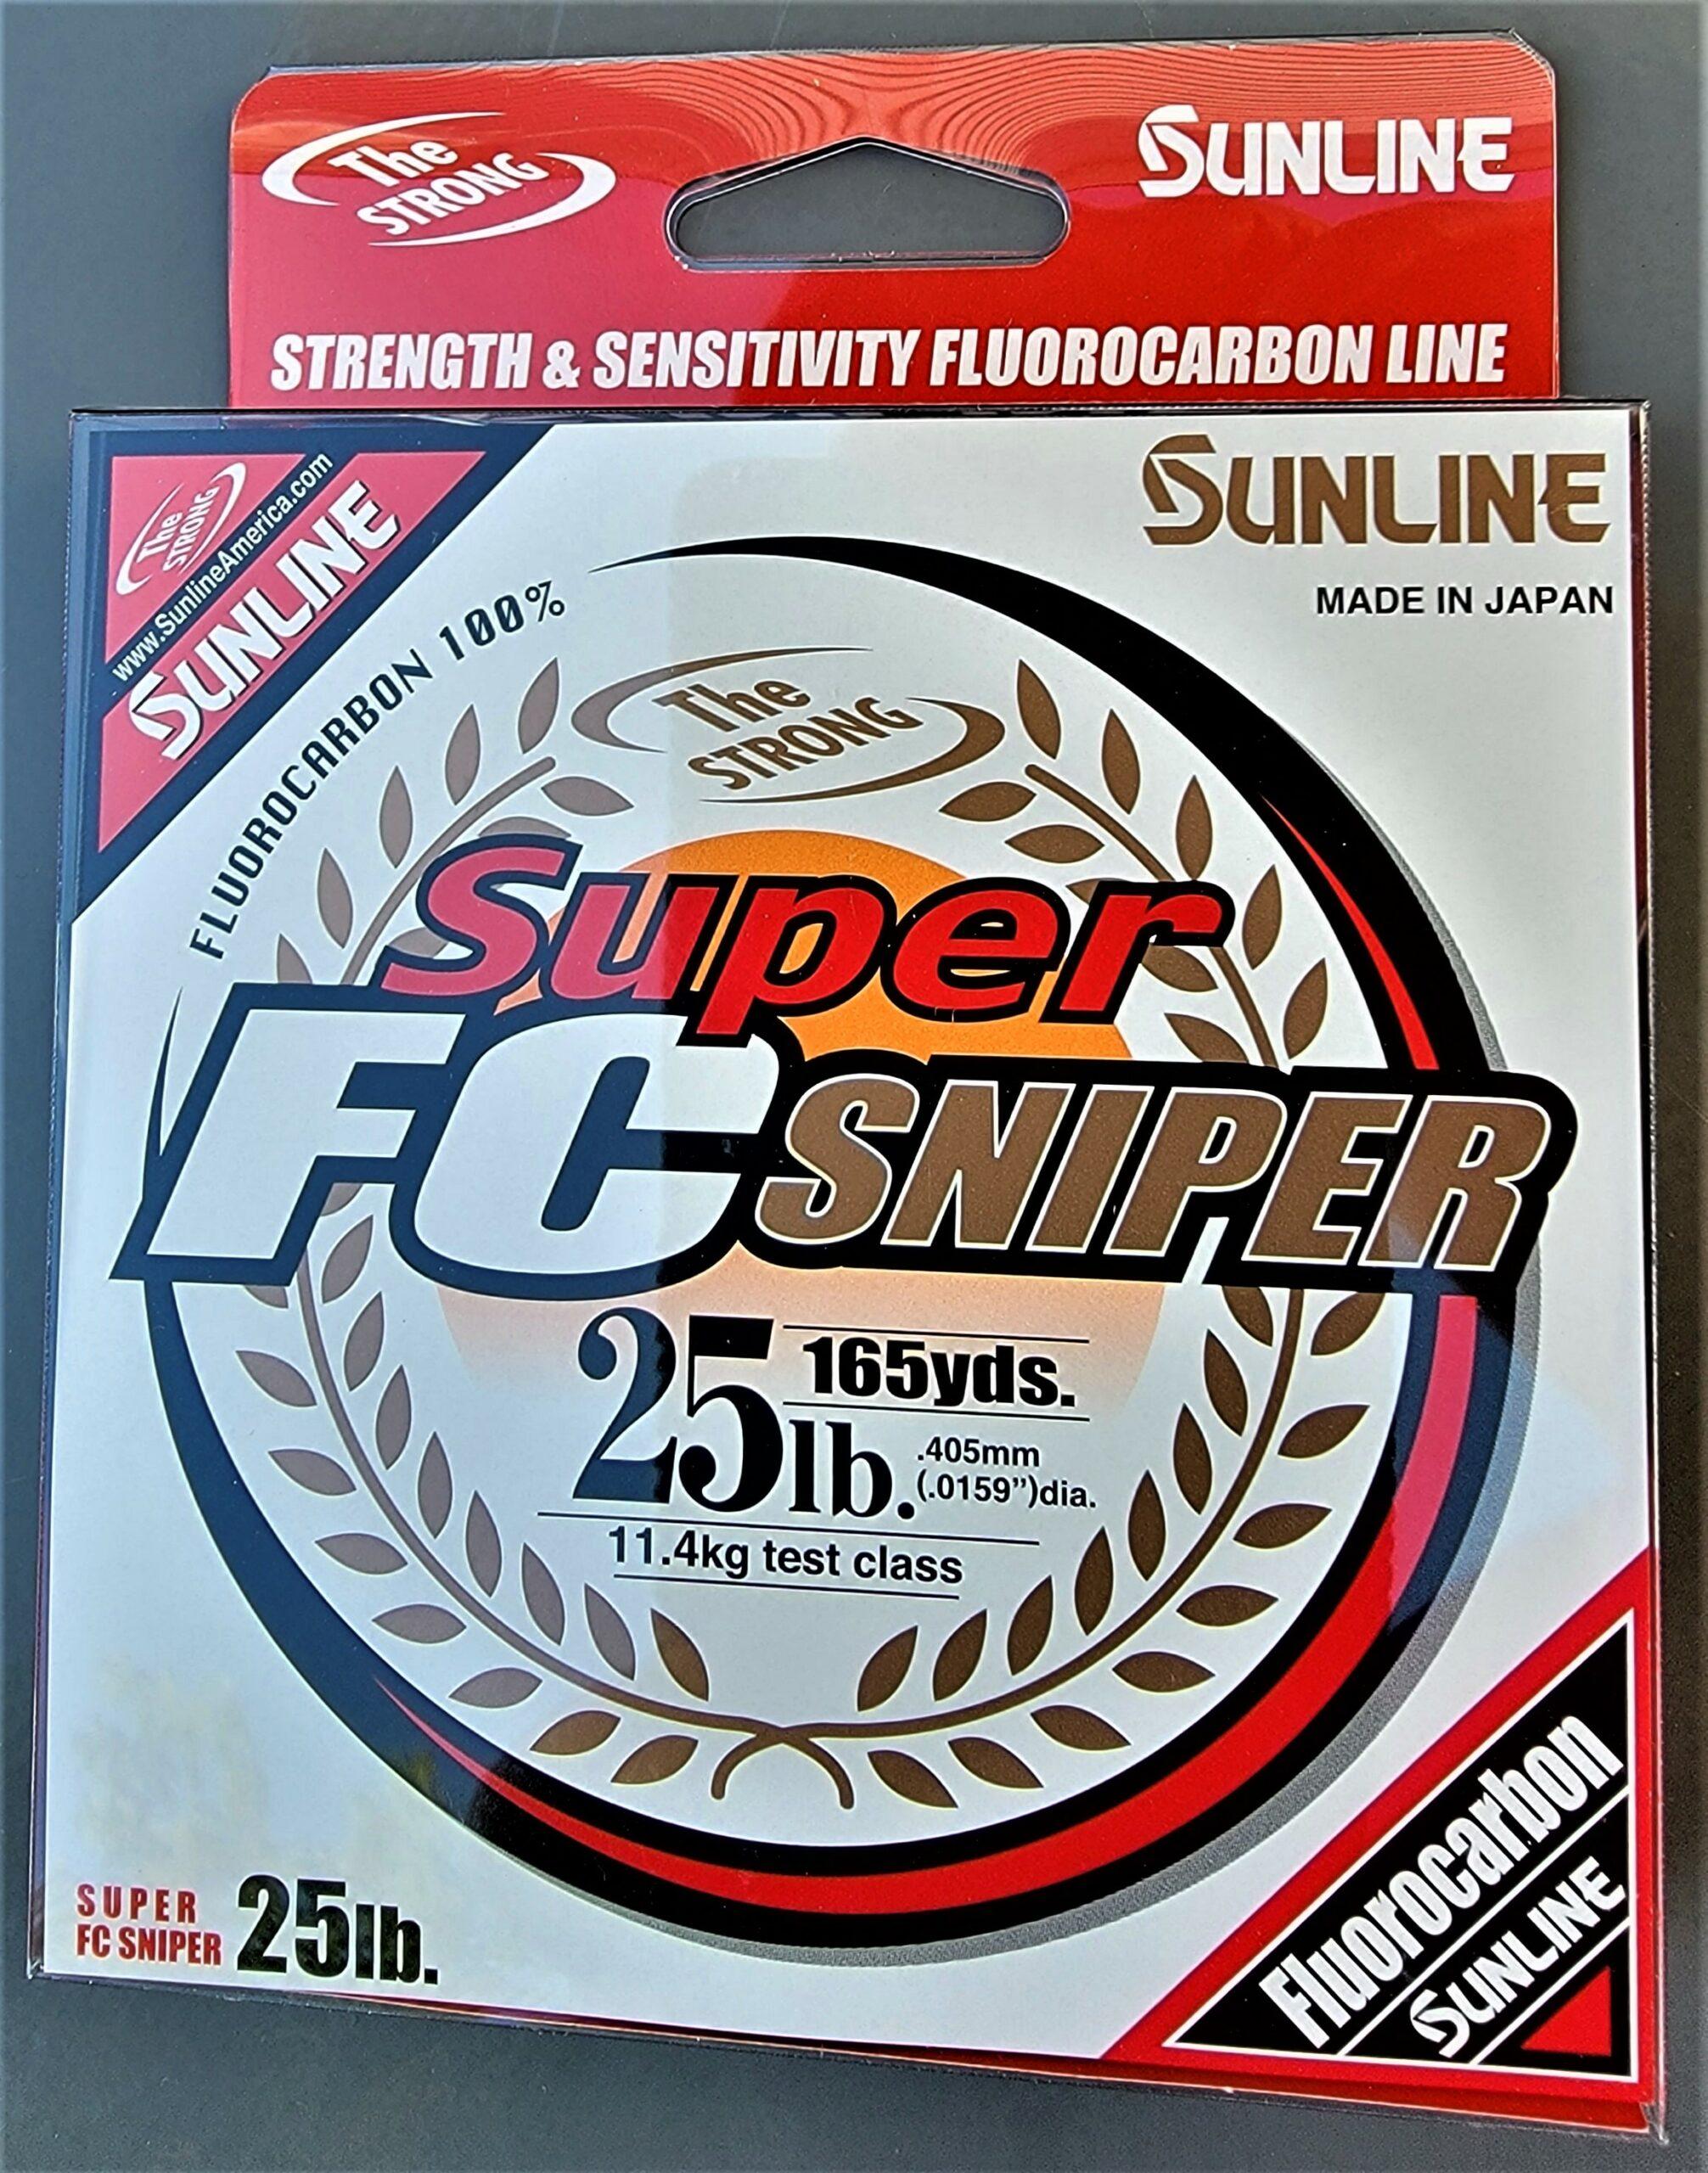 Sunline - Super FC Sniper - 165 YD - Super FC Sniper - 25 LB - Natural Clear